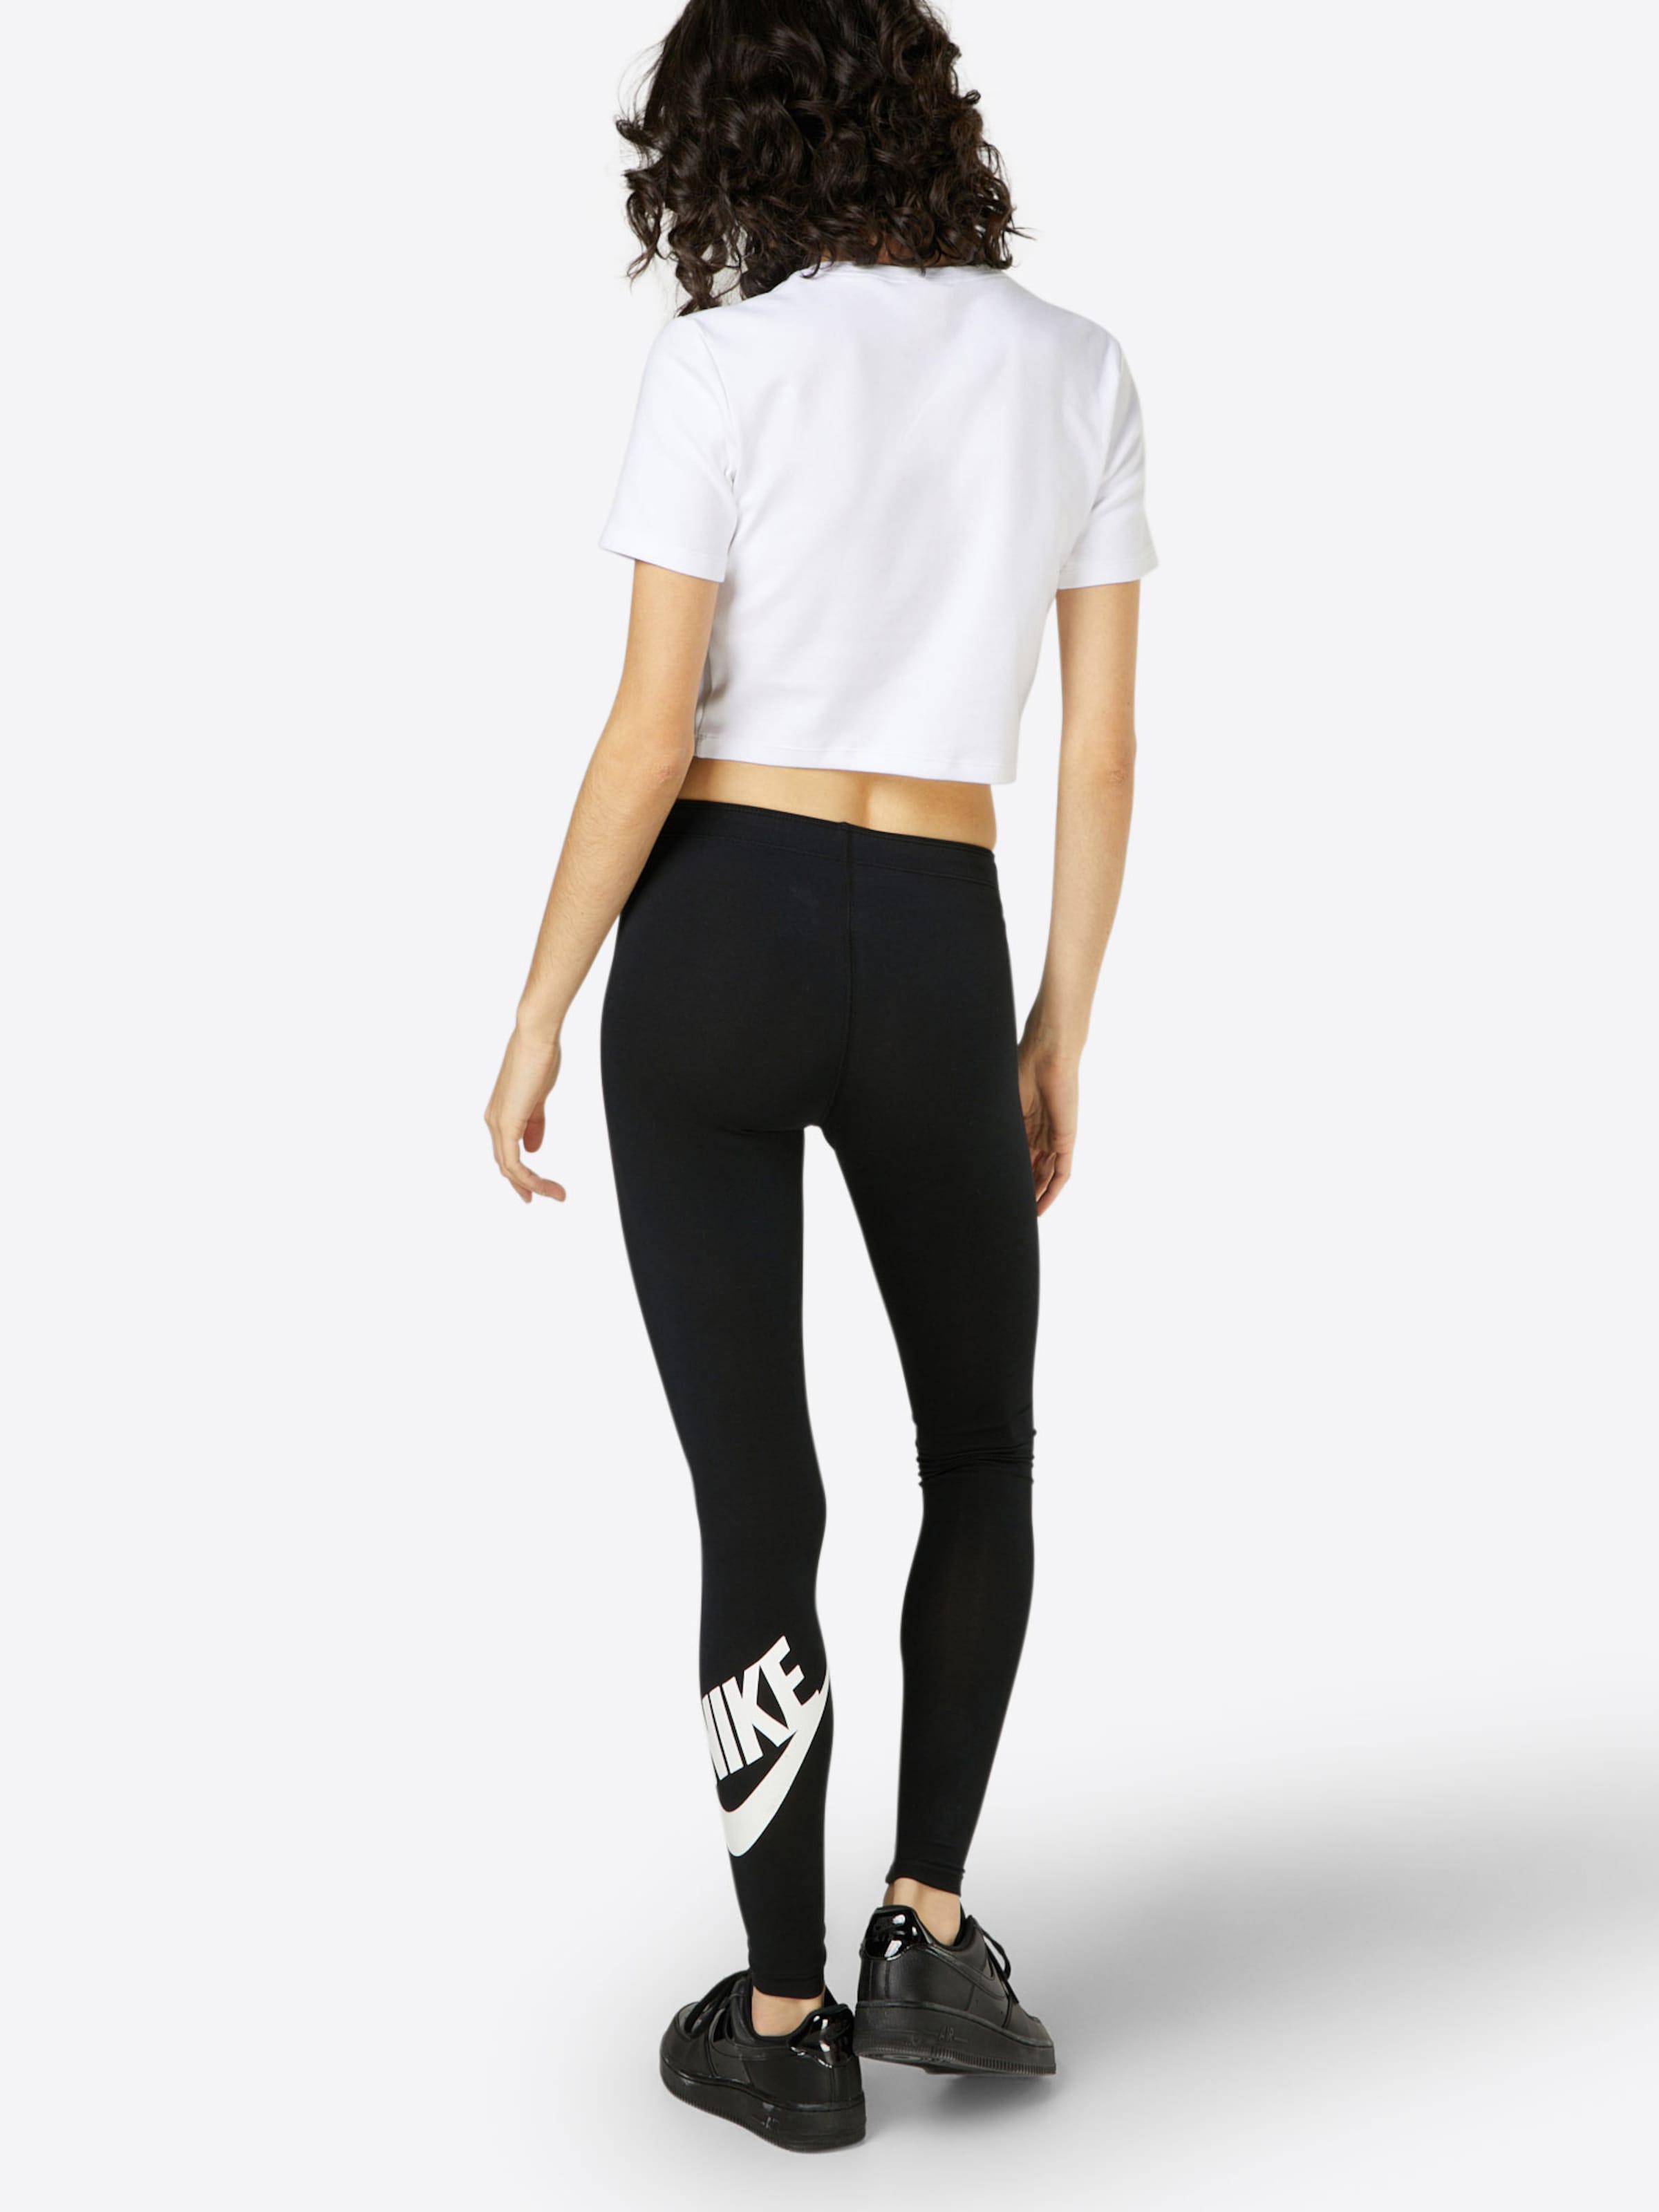 Nike Sportswear Leggings 'Legasee Logo' Wirklich Günstig Online q1hfA